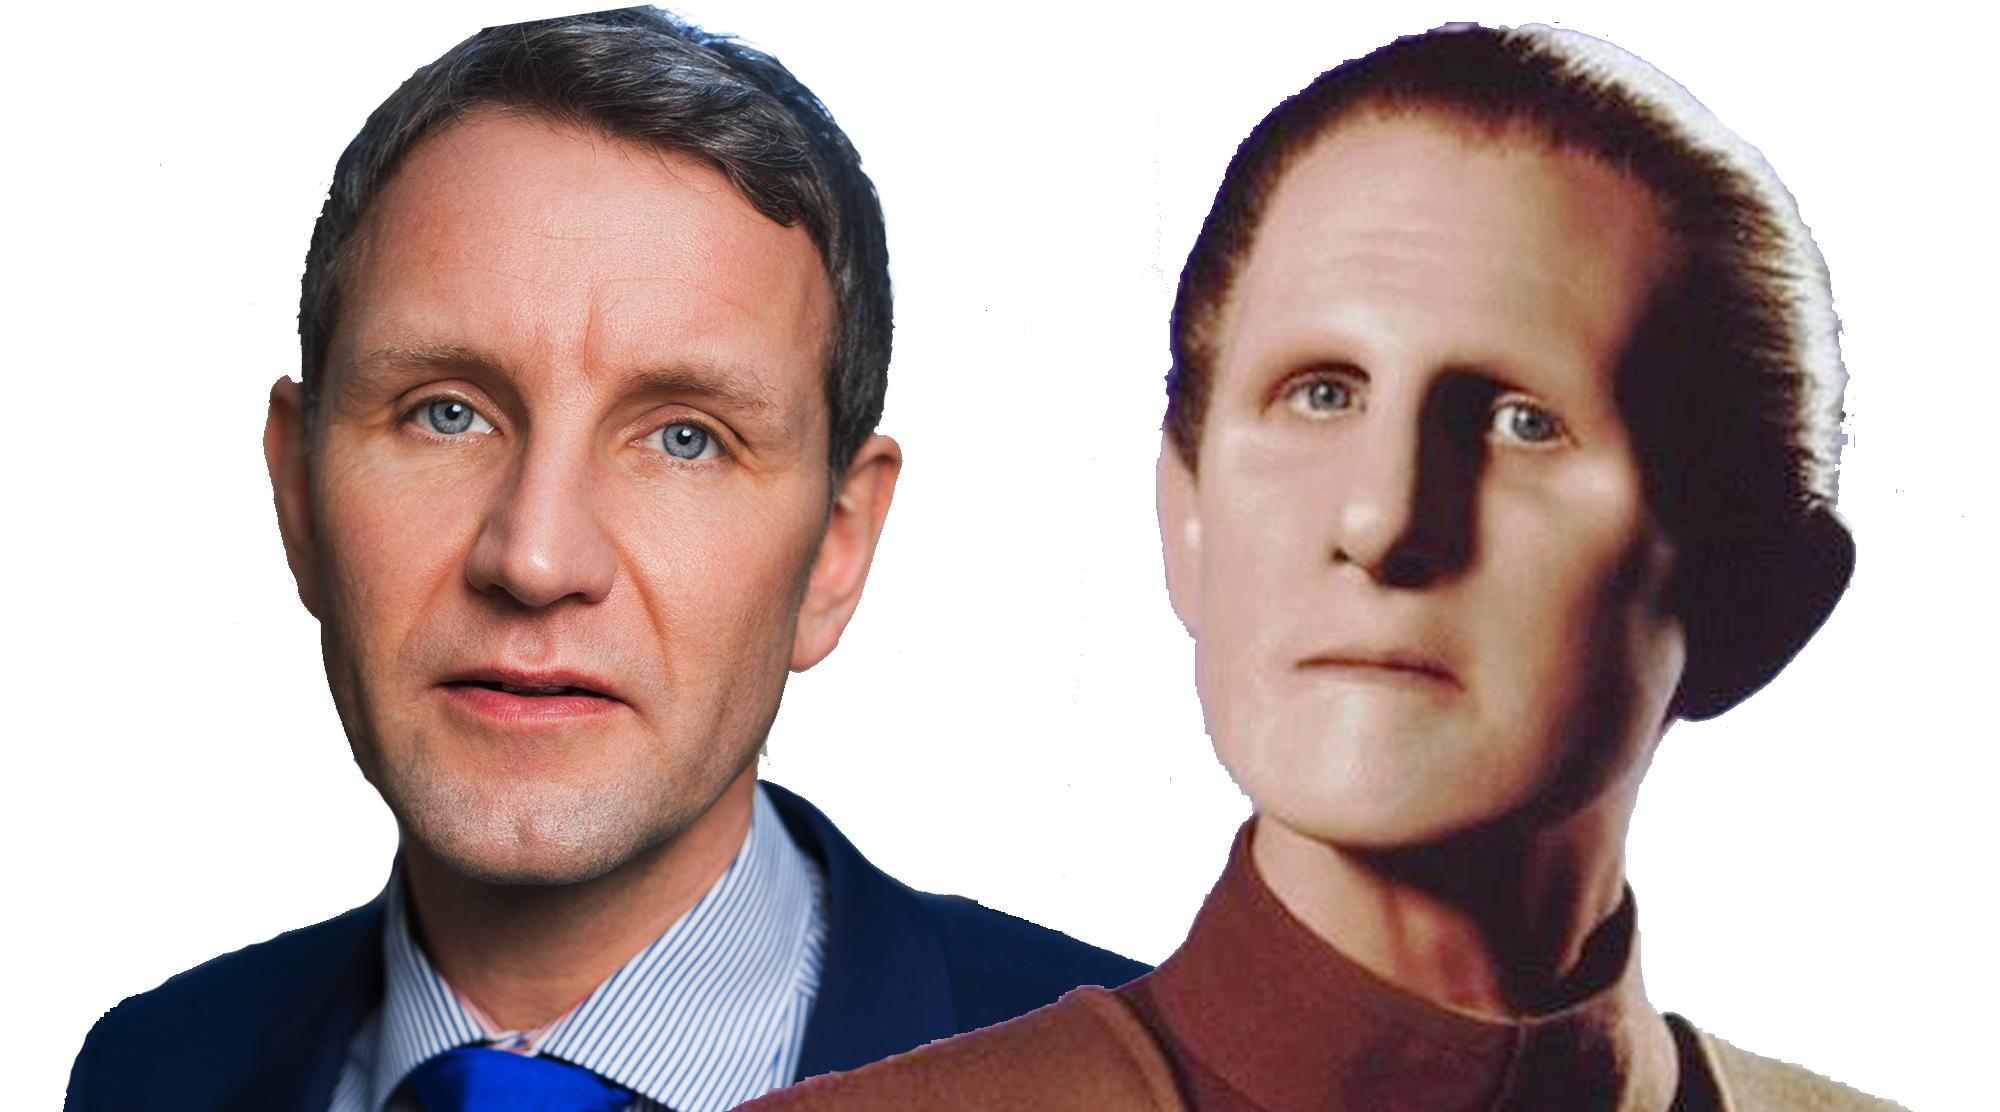 Björn oder Bernd Höcke als ODO (René Auberjonois)?